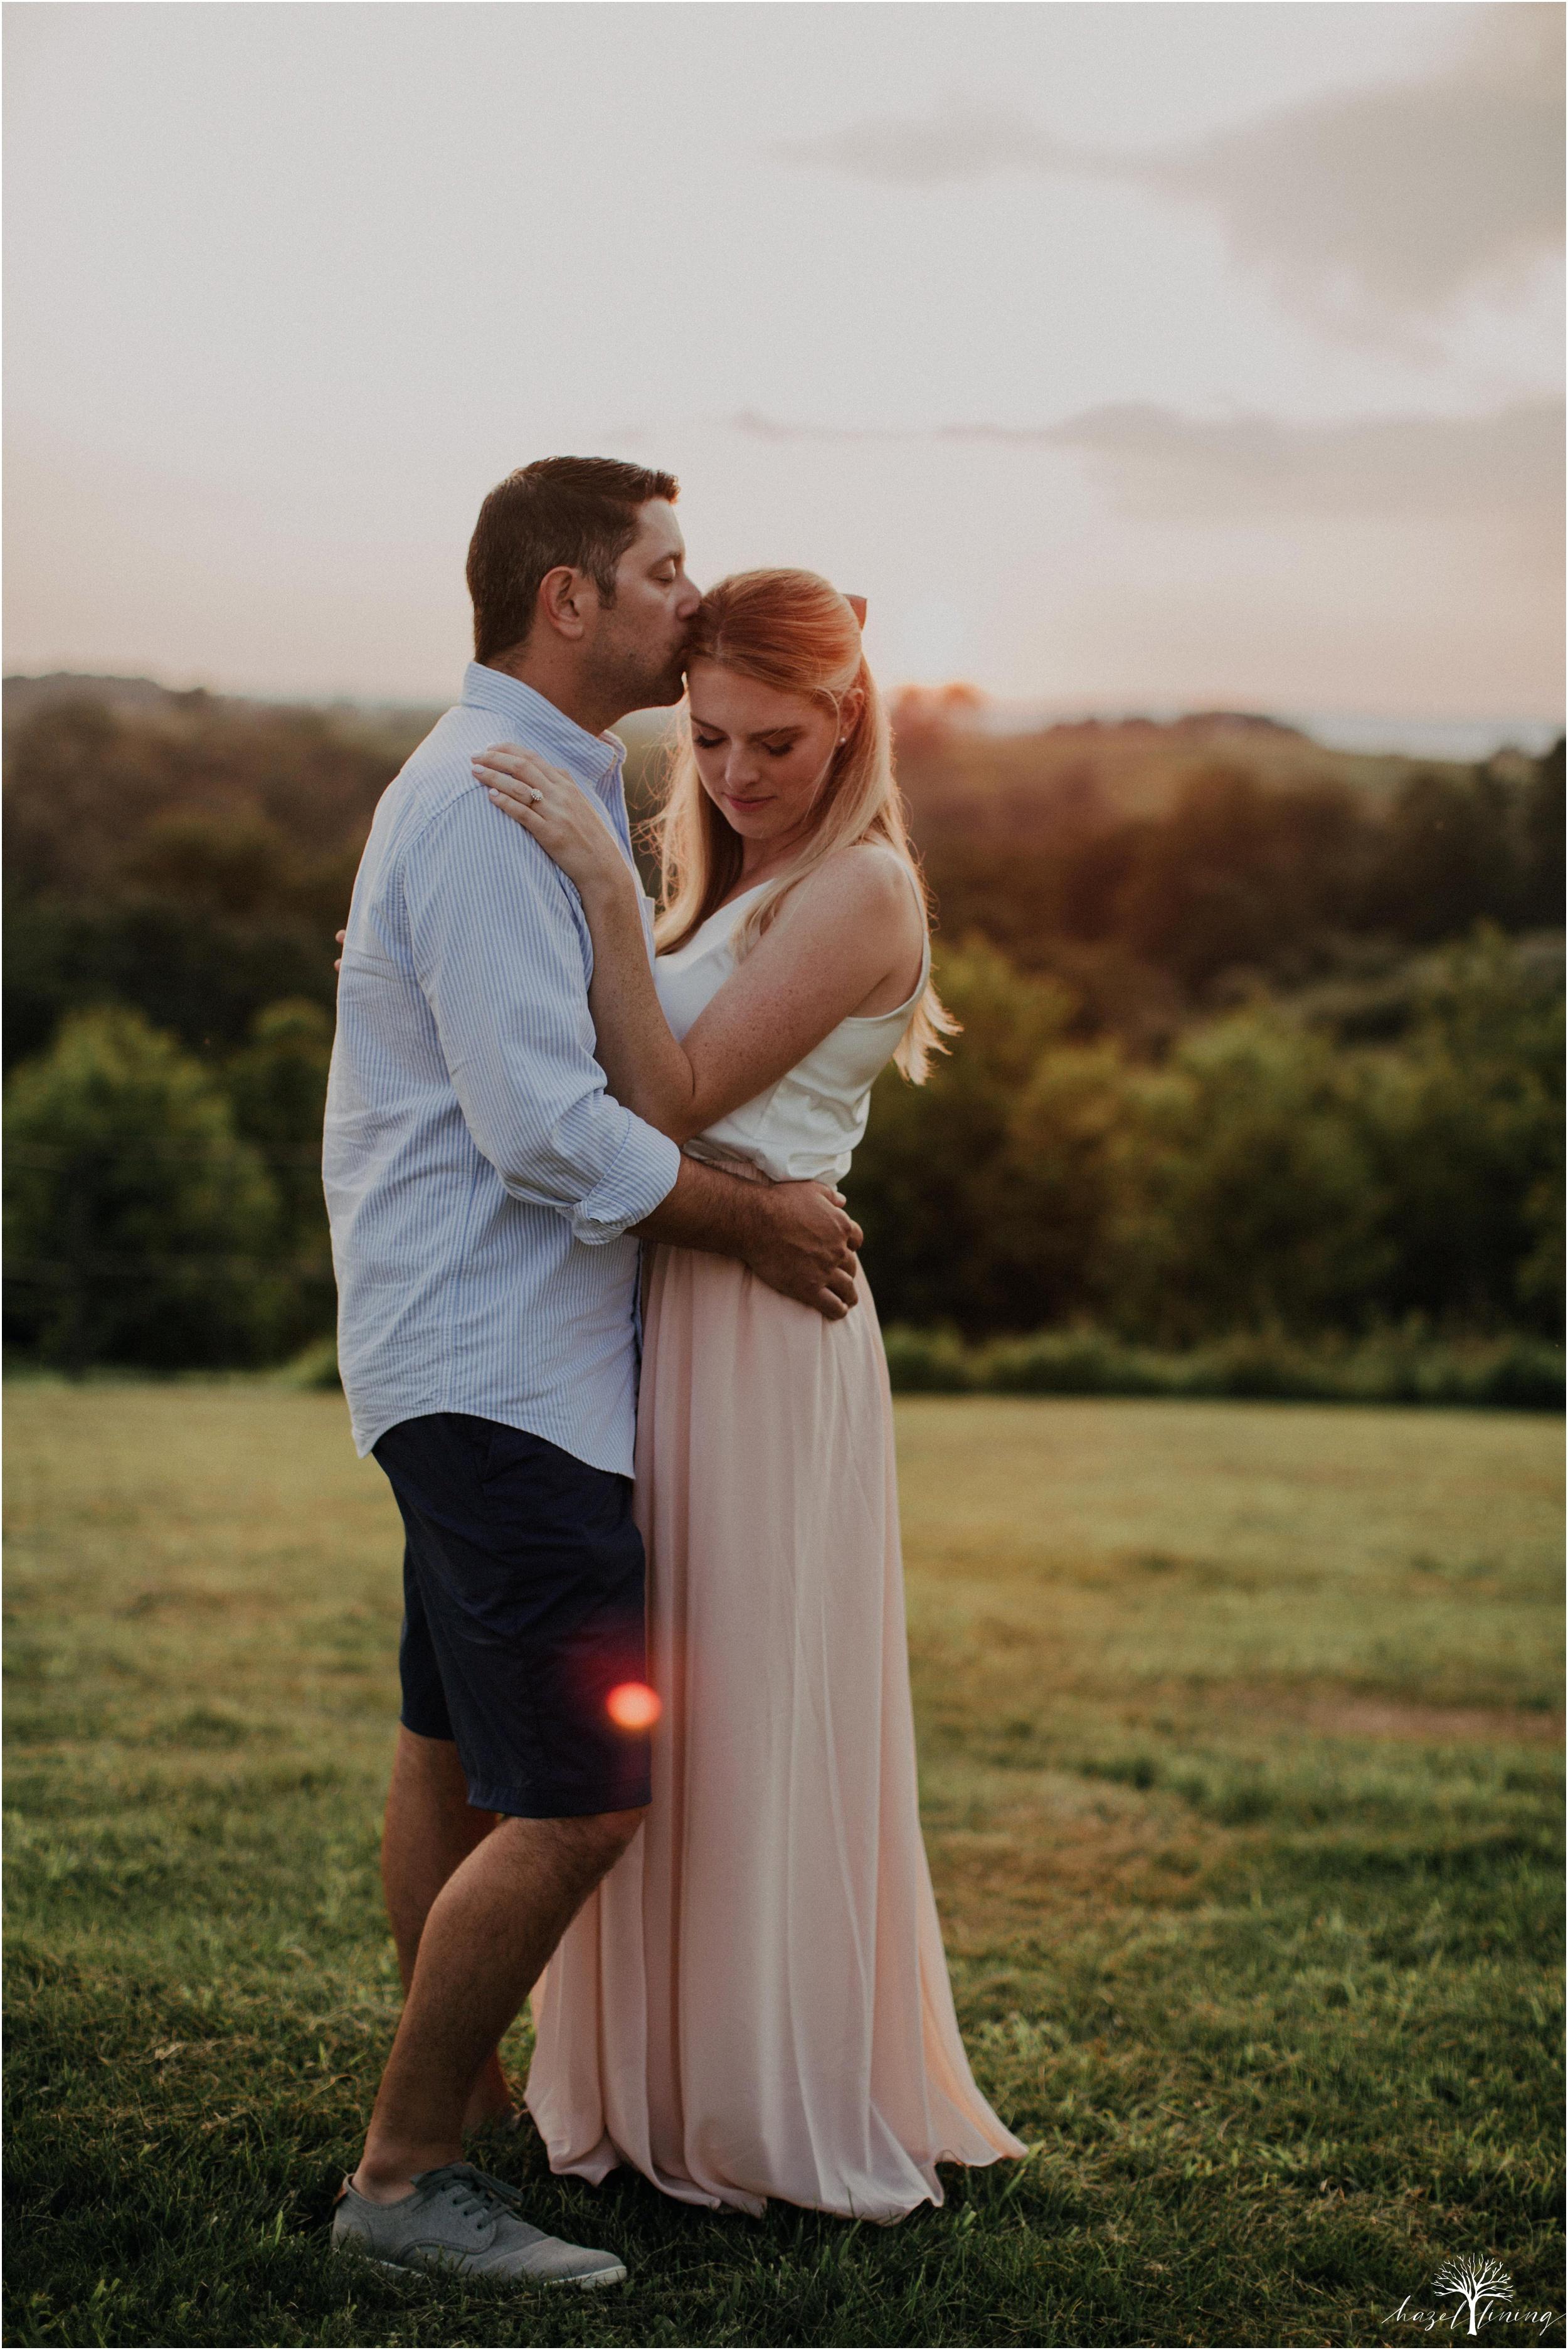 ashley-fillmore-steve-reimer-trexler-nature-preserve-summer-engagement-session-schnecksville-pennsylvania-hazel-lining-photography-destination-elopement-wedding-engagement-photography_0044.jpg